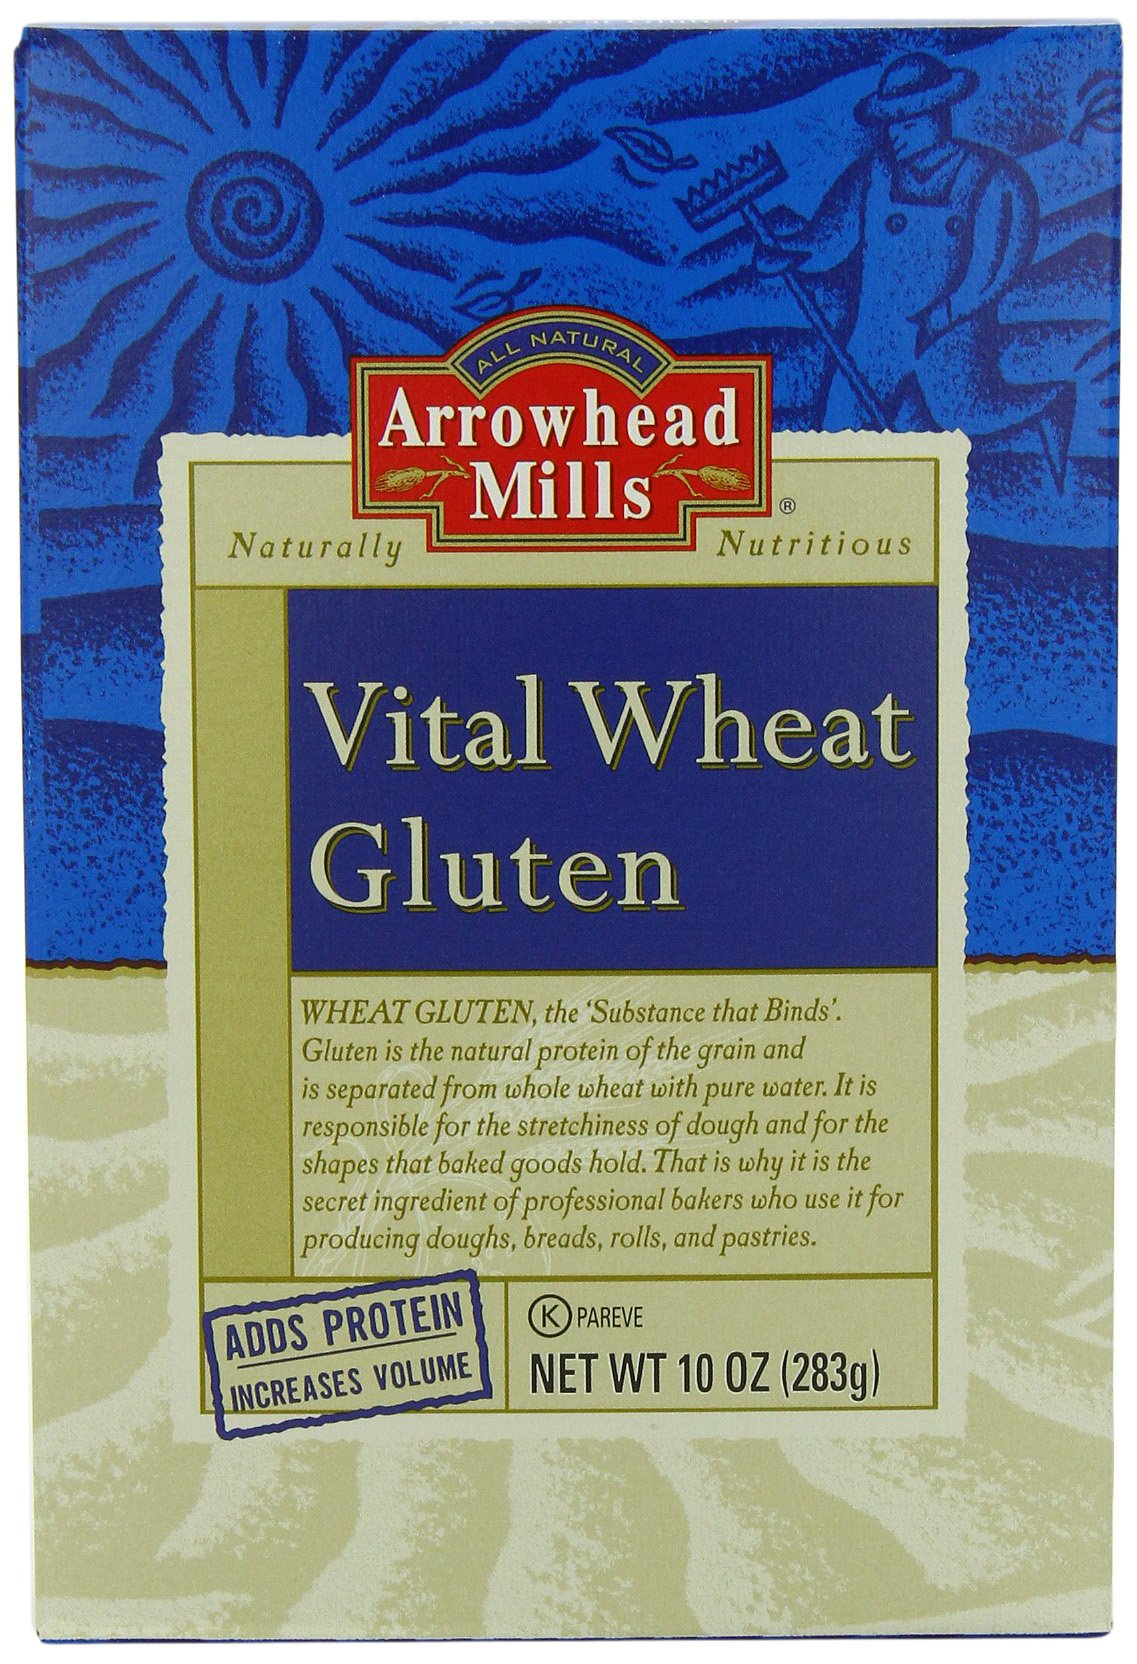 Arrowhead Mills Vital Wheat Gluten, 10 Ounce (Pack of 12) by Arrowhead Mills